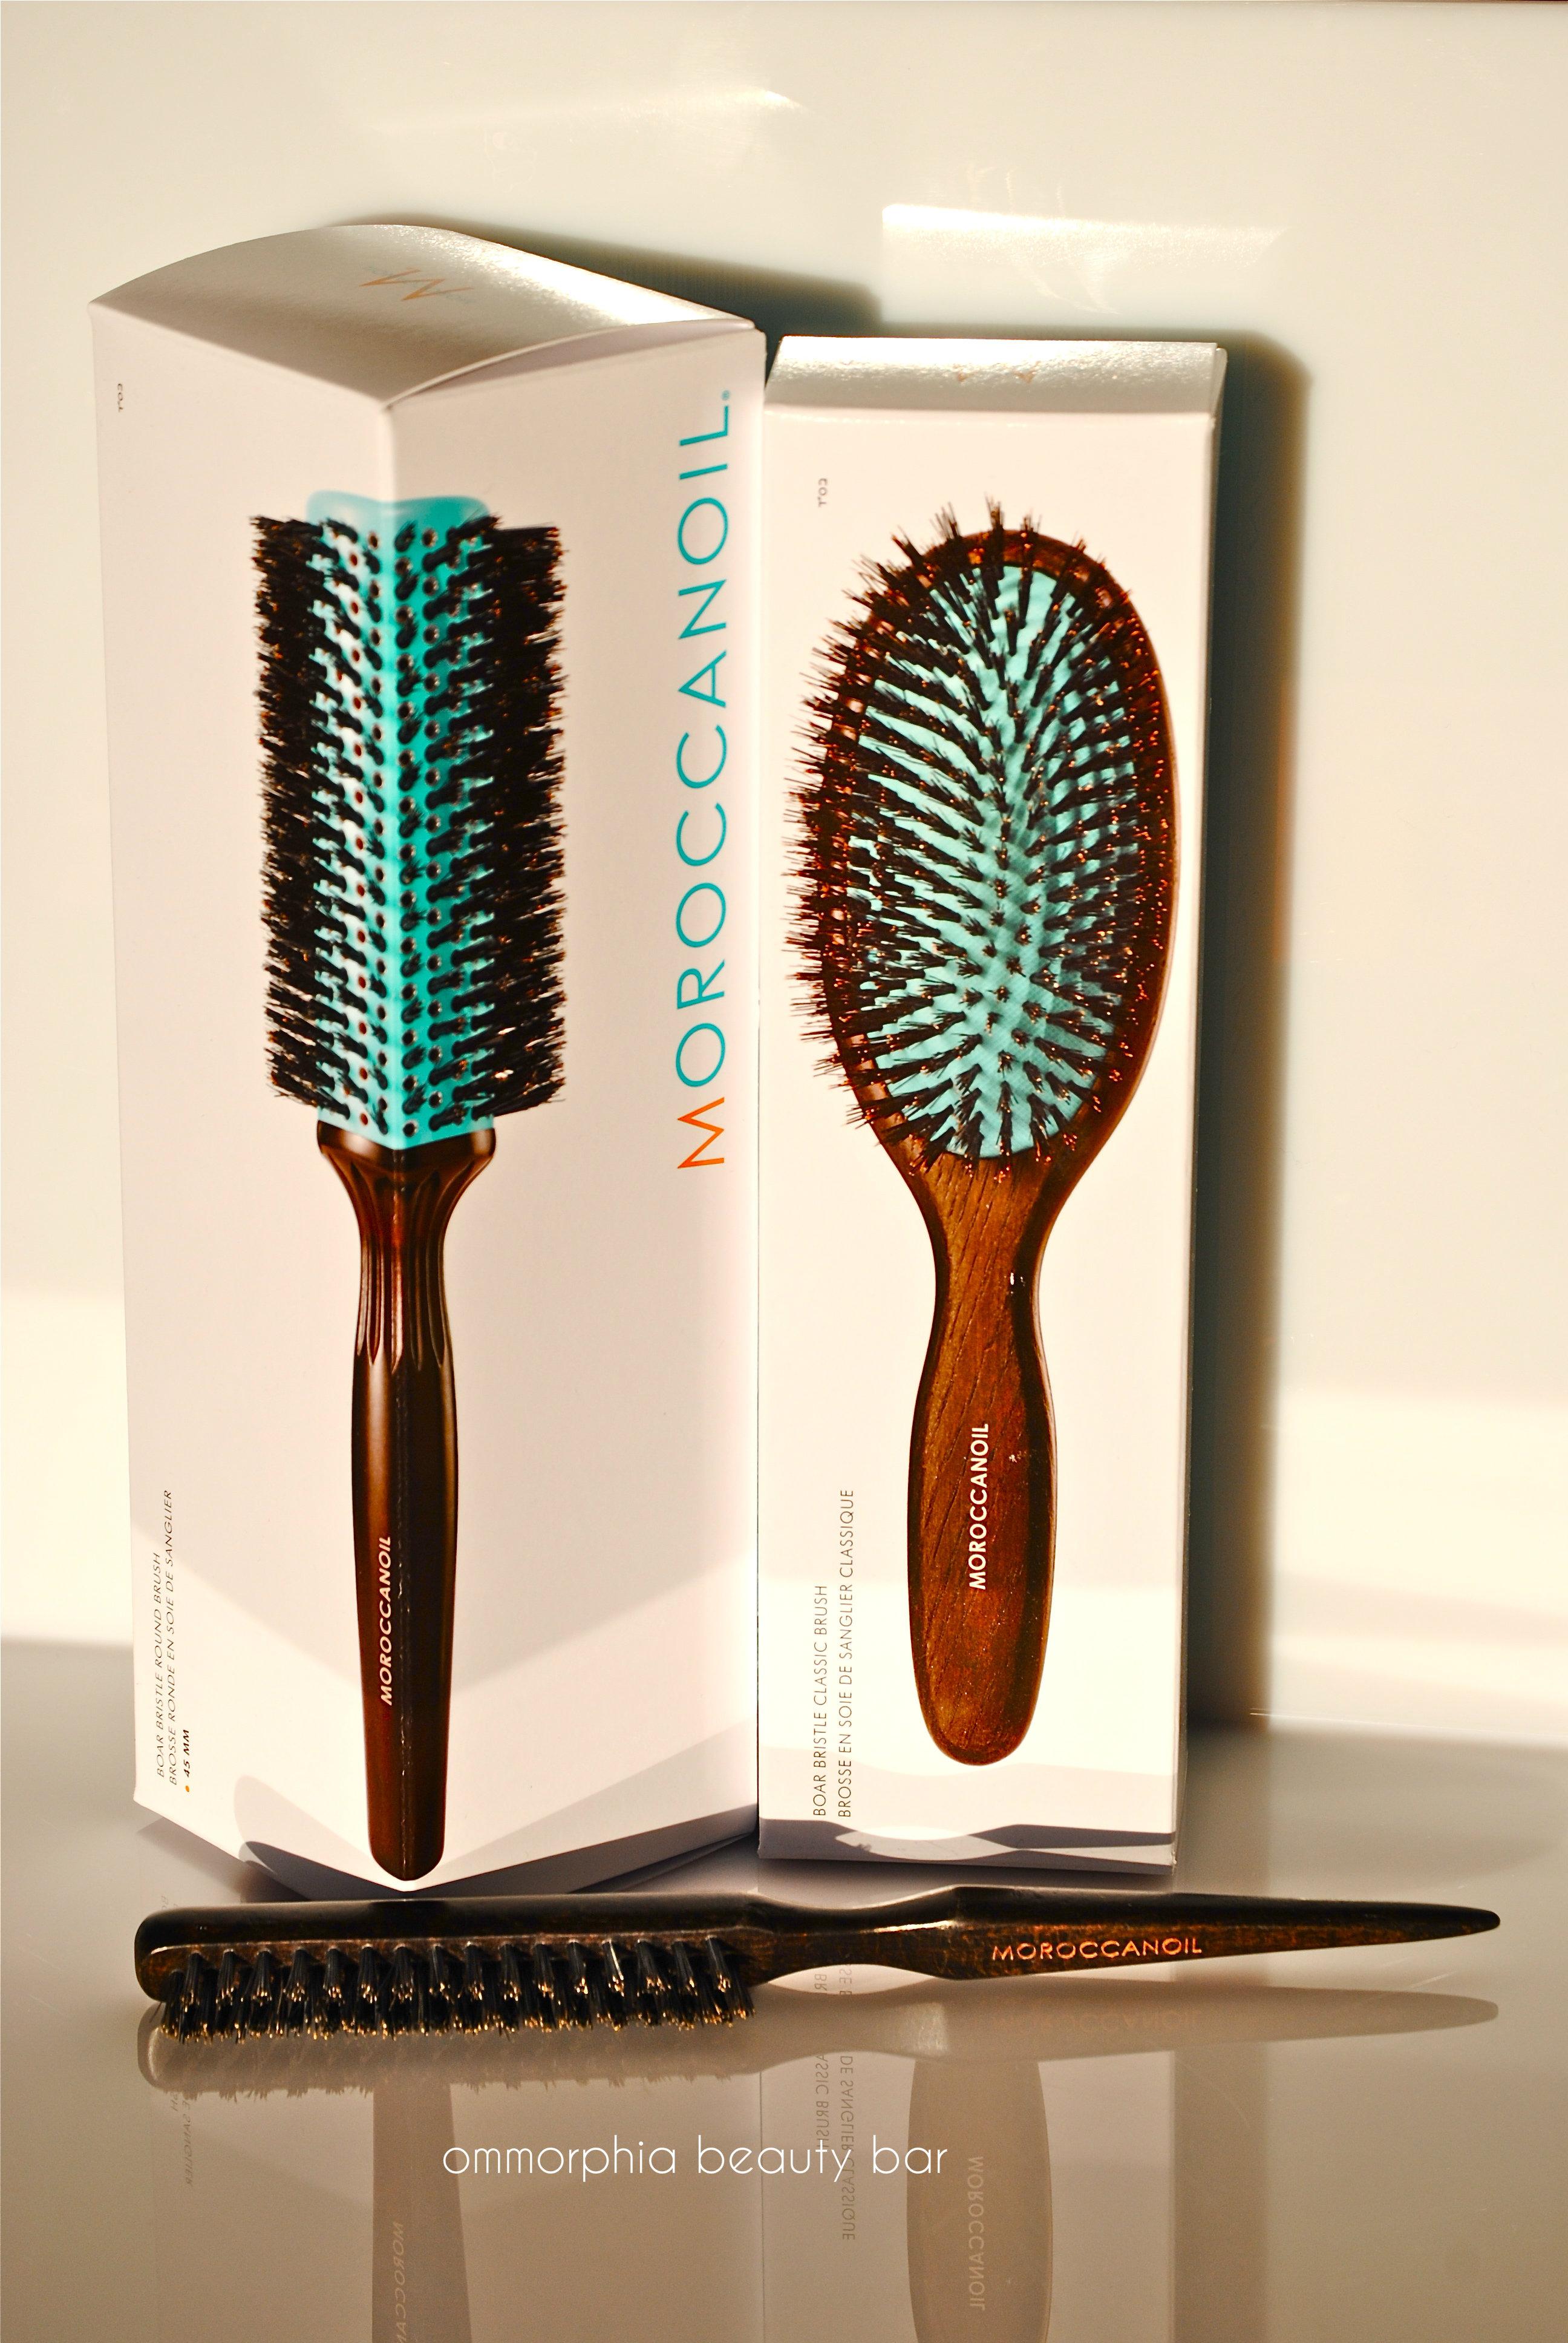 Moroccanoil hair brushes boxed